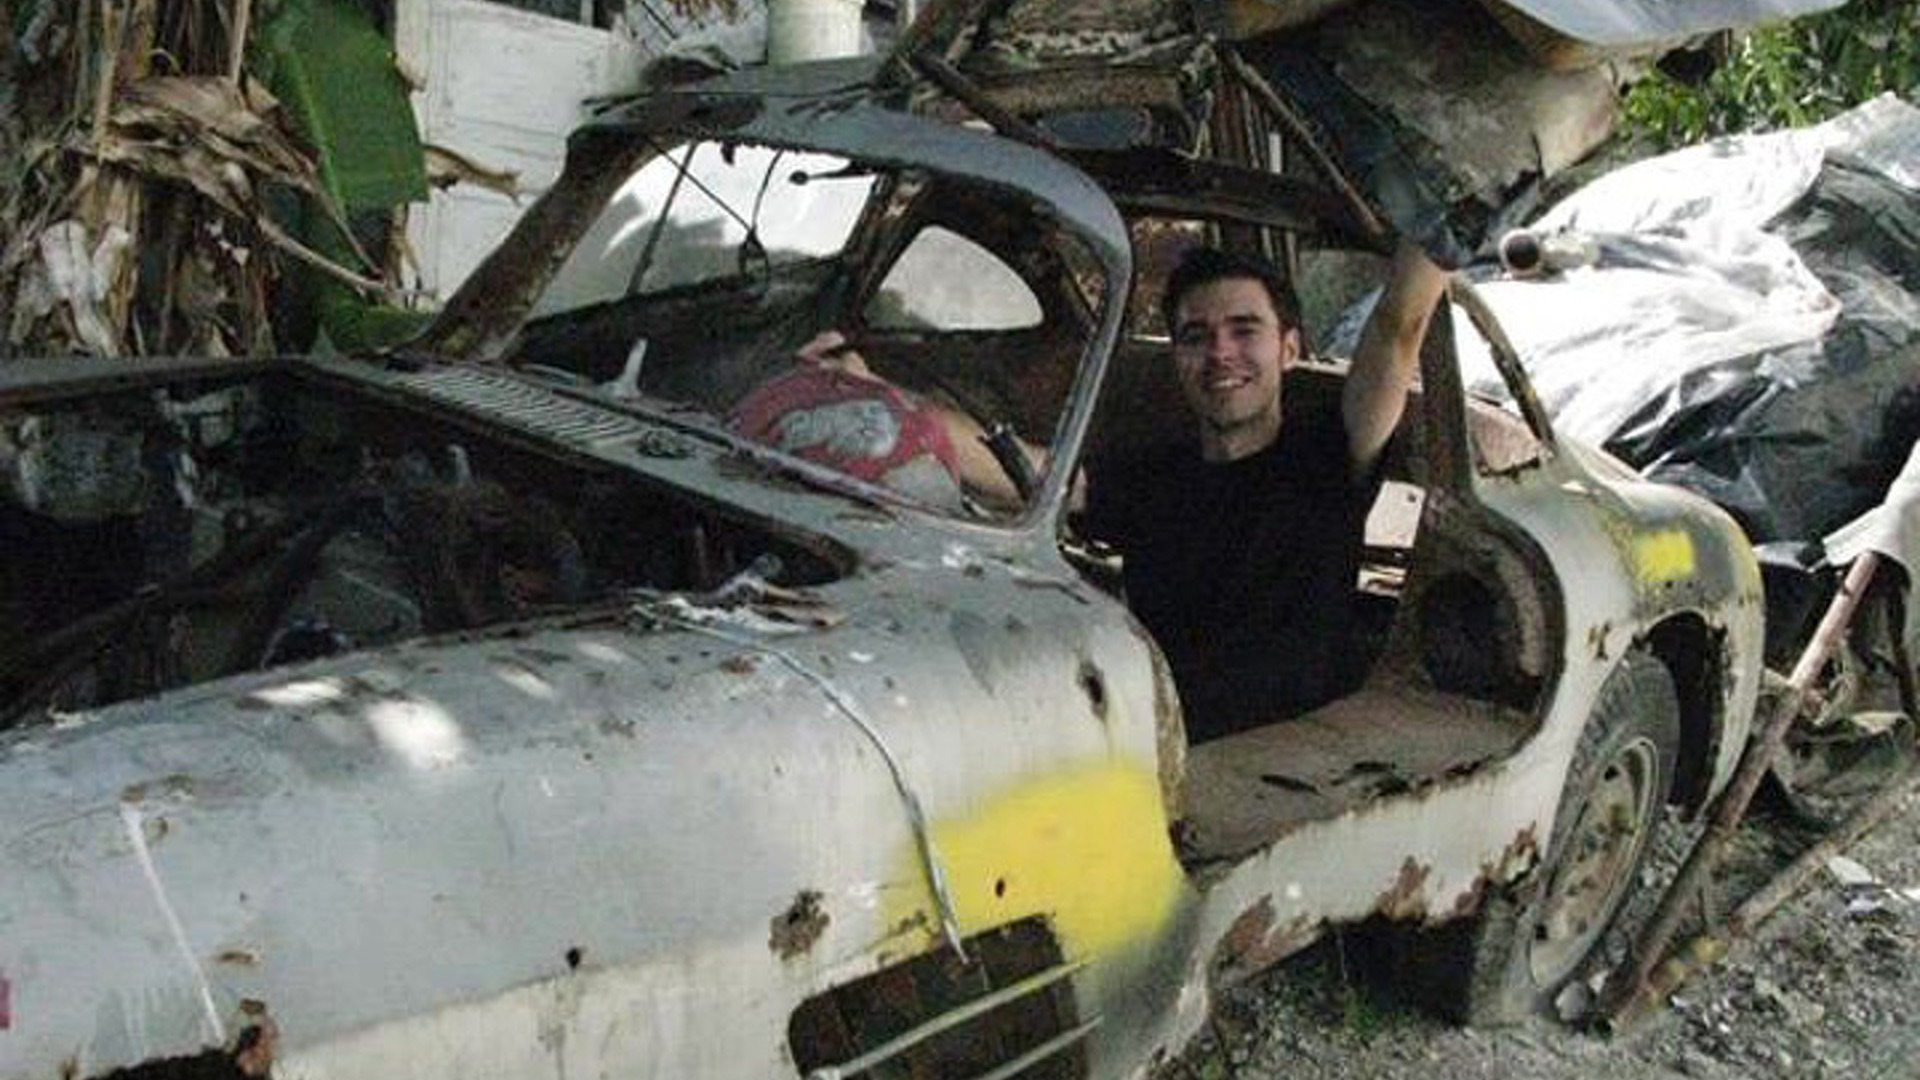 Kickstarter Campaign Aims to Create a World-Class Auto Museum